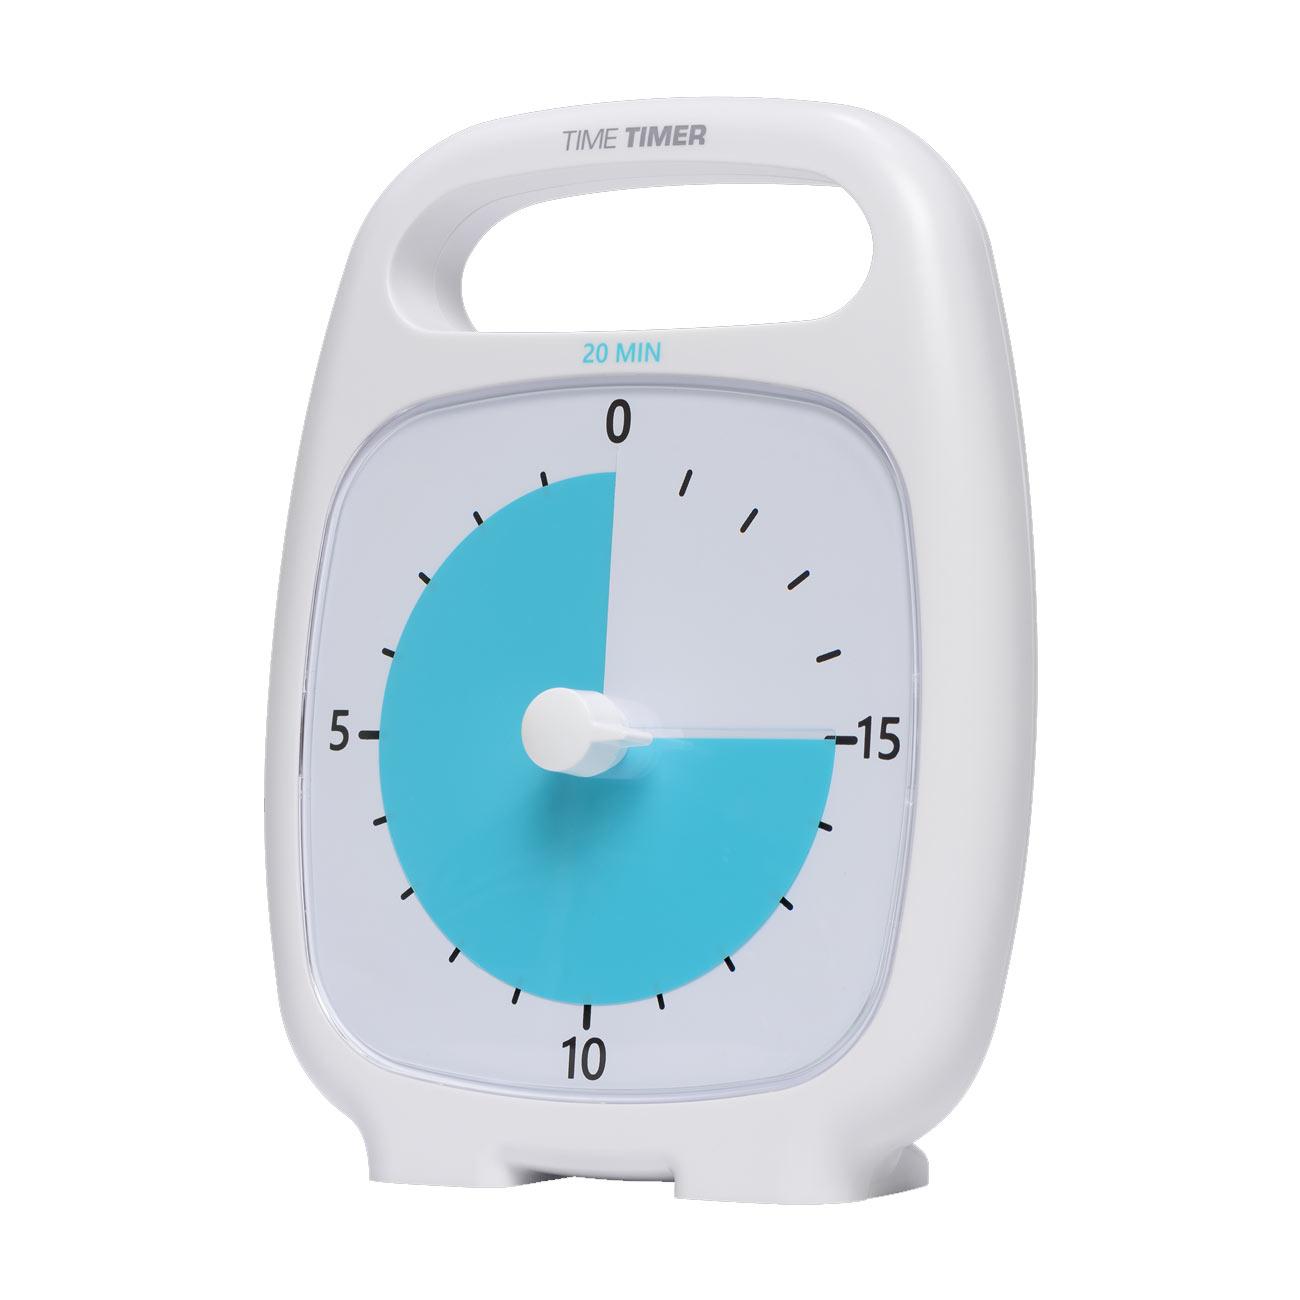 Time Timer Plus - 20 Minute - White